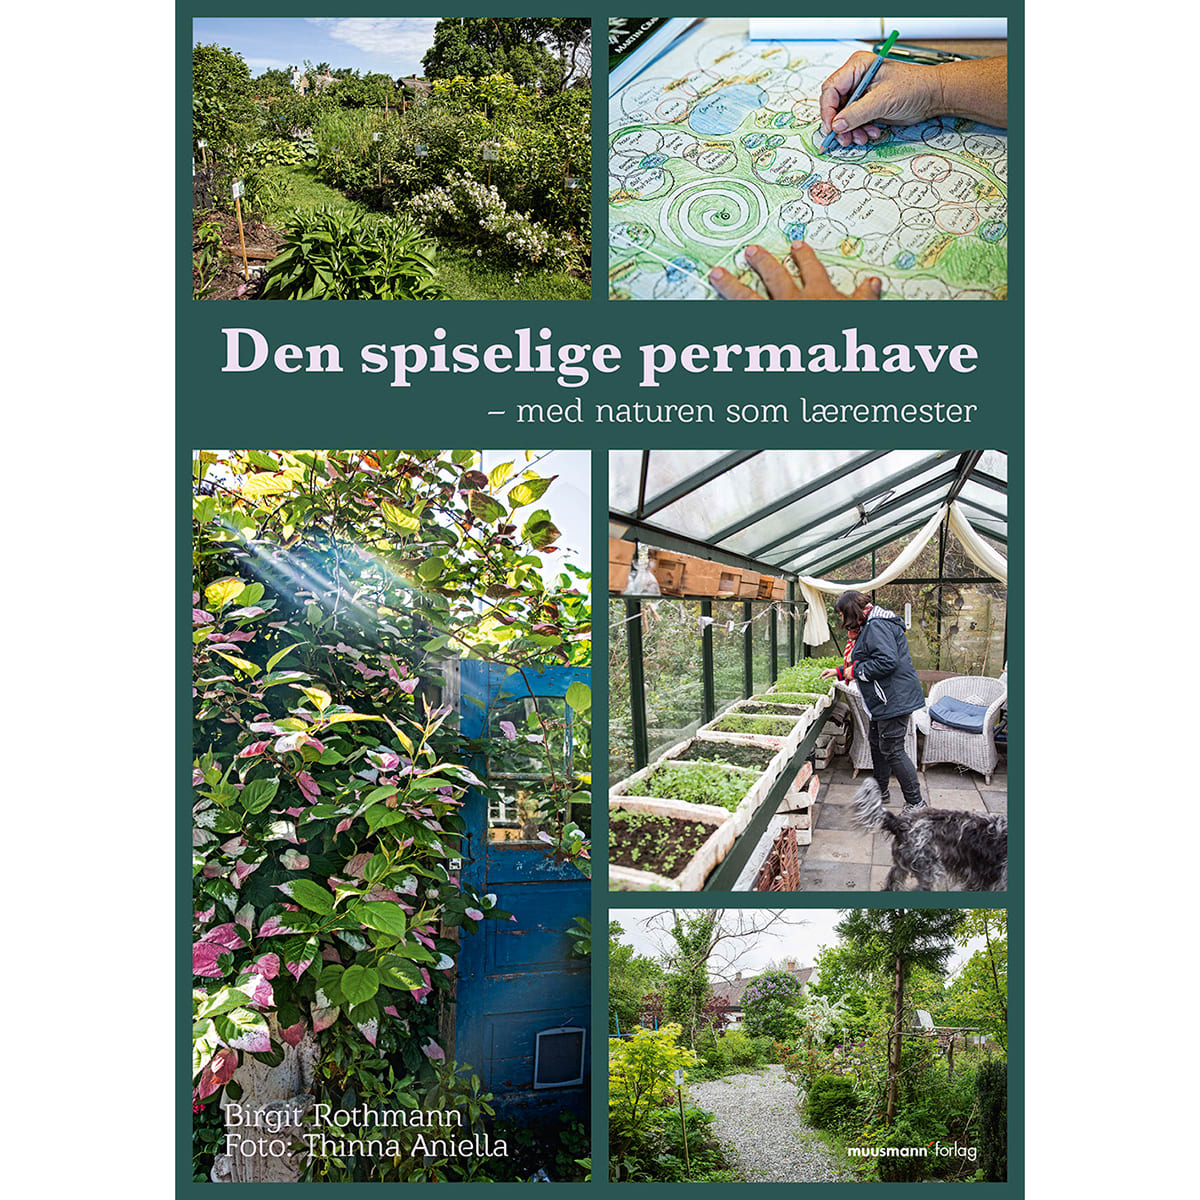 Af Birgit Rothmann & Thinna Aniella Michelsen